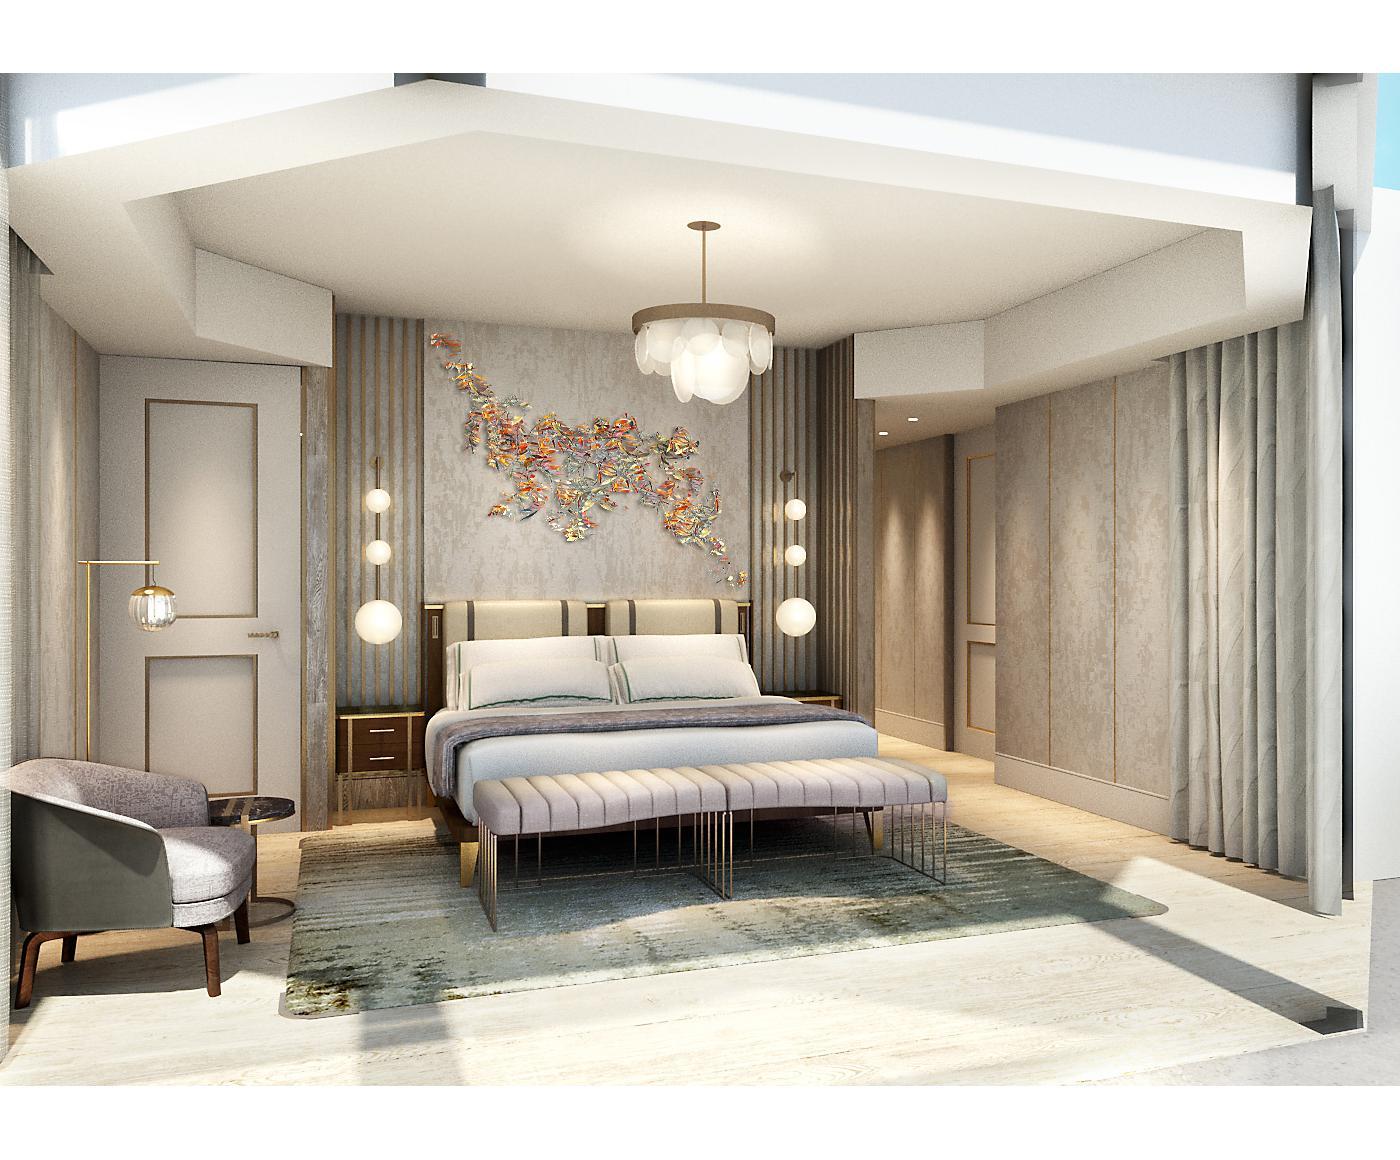 london-2017-rendering-penthouse-suite-master-bedroom